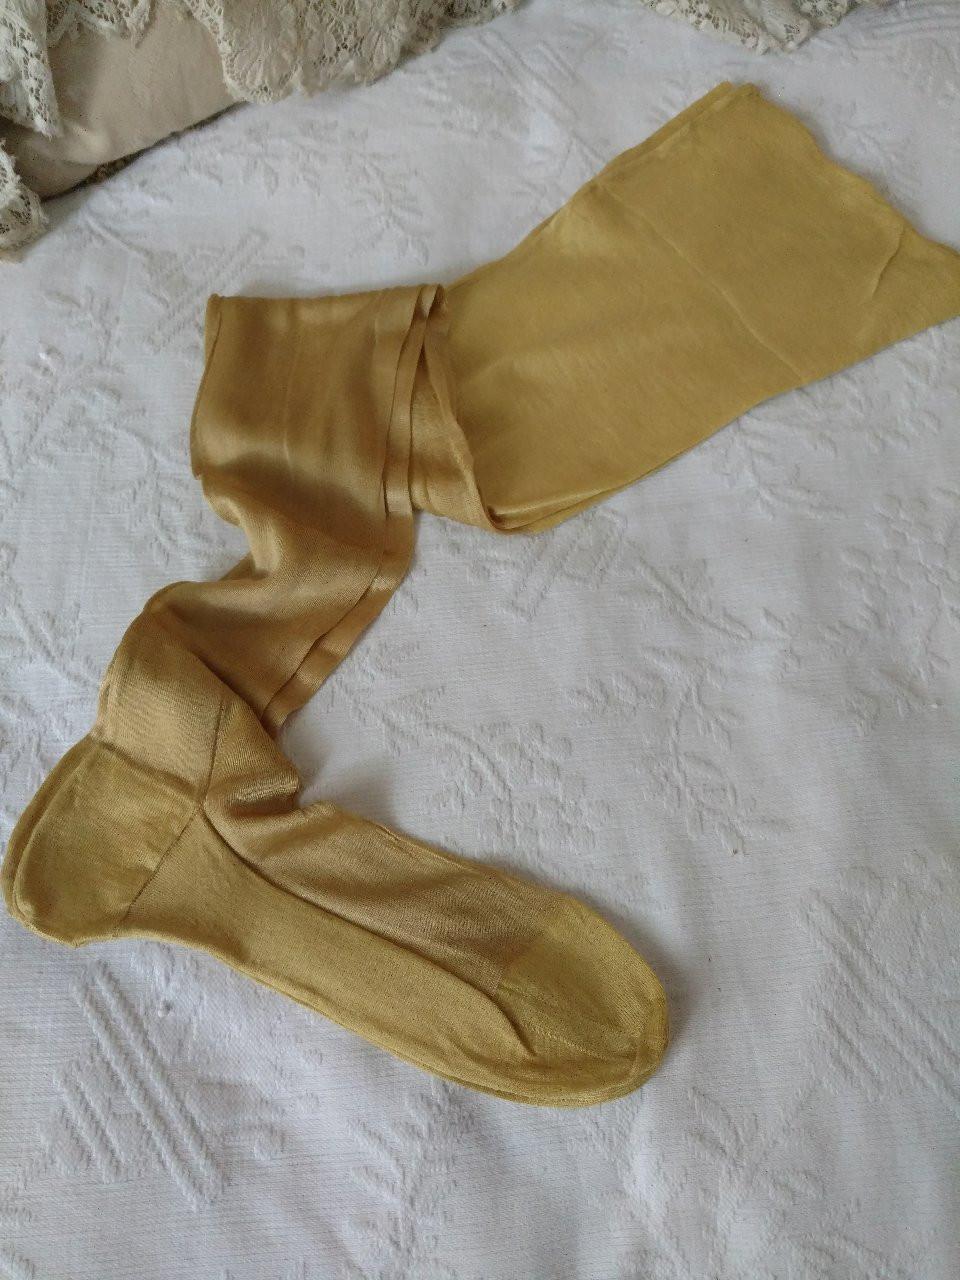 Antique Yellow Silk Rayon Stockings 1920s Flapper Hosiery Full Fashion